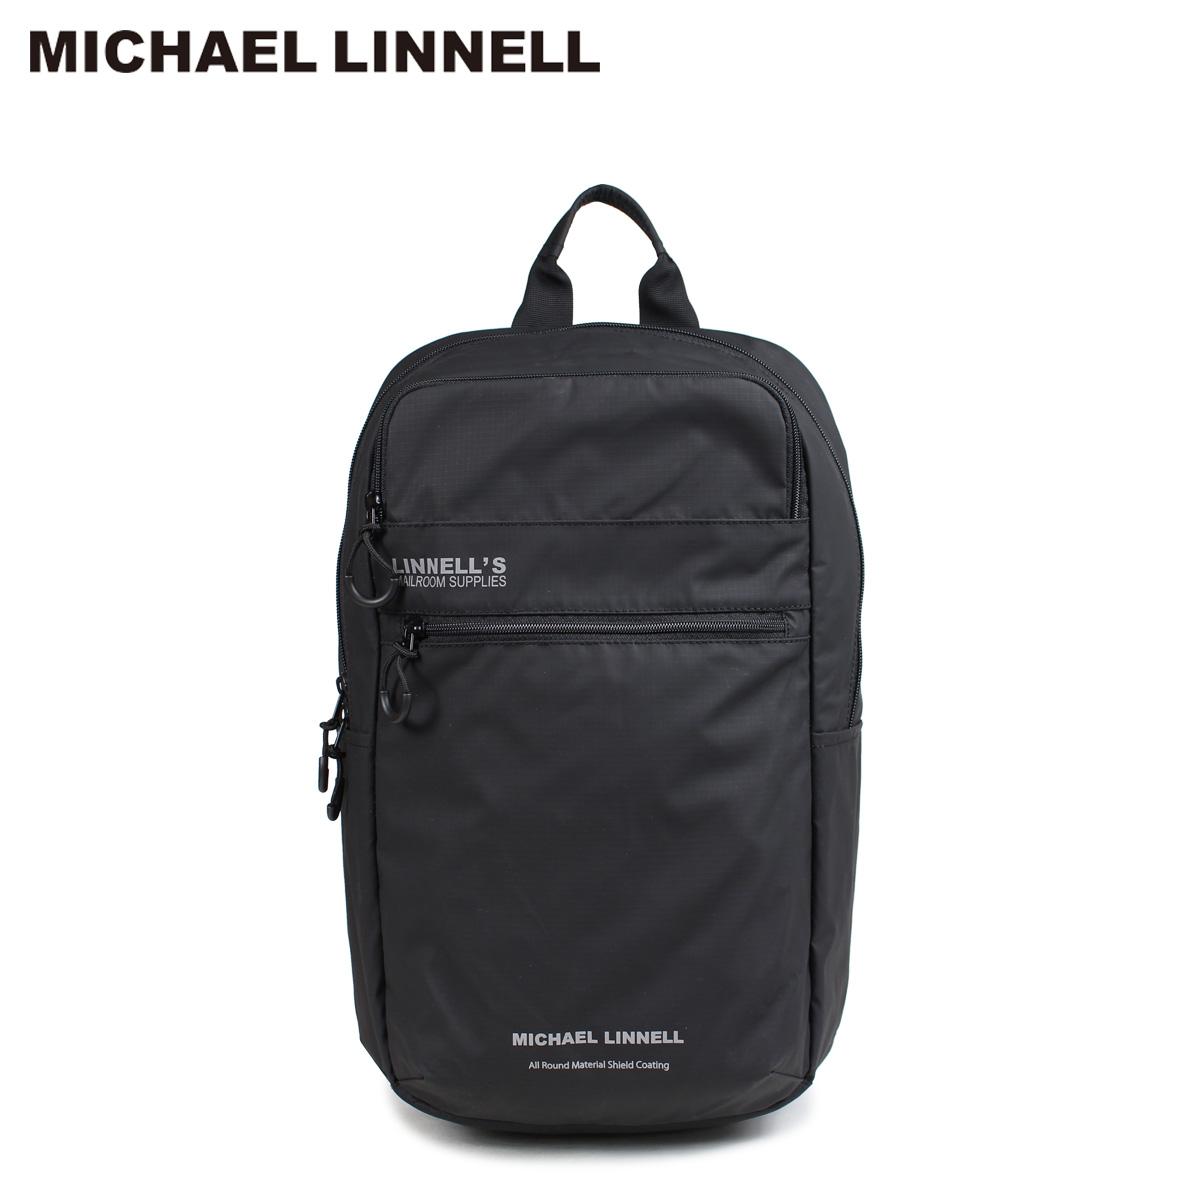 MICHAEL LINNELL BACKPACK マイケルリンネル リュック バッグ 23L メンズ レディース バックパック ブラック MLAC-05